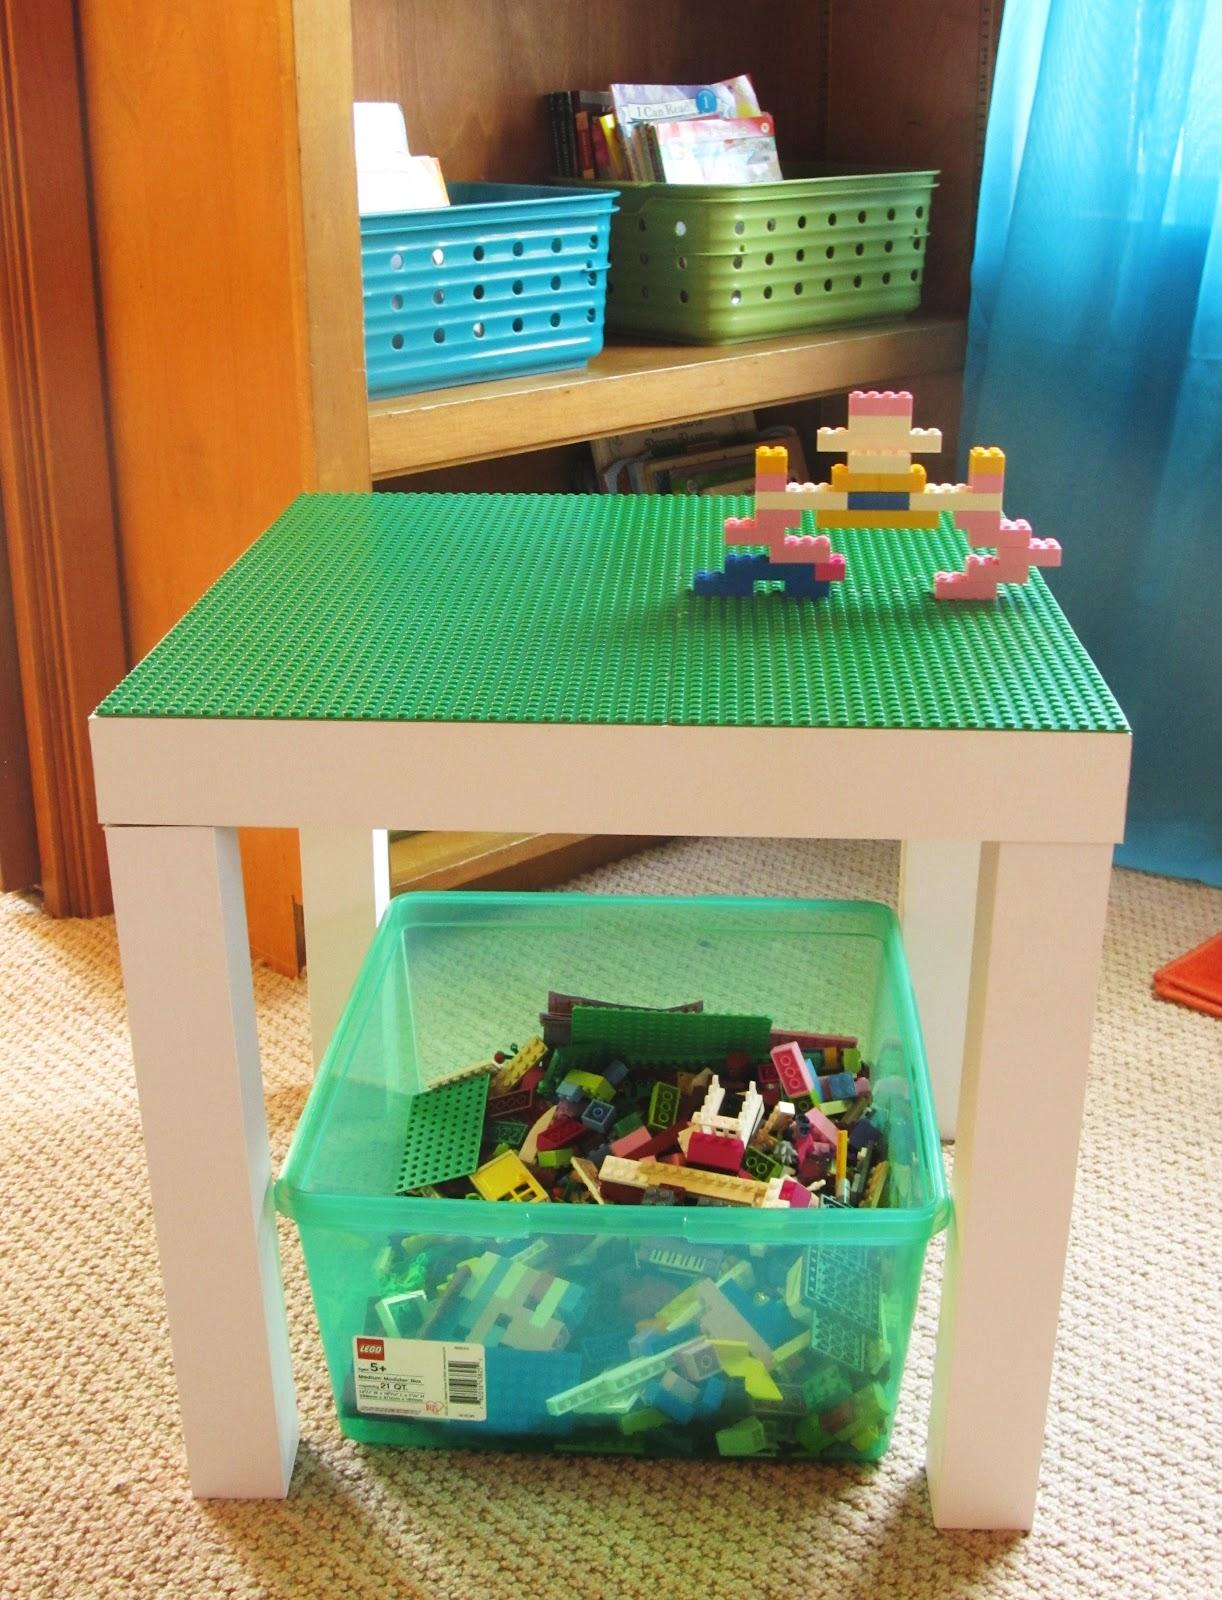 jessica 39 s jabber home school classroom sneek peak lego table. Black Bedroom Furniture Sets. Home Design Ideas